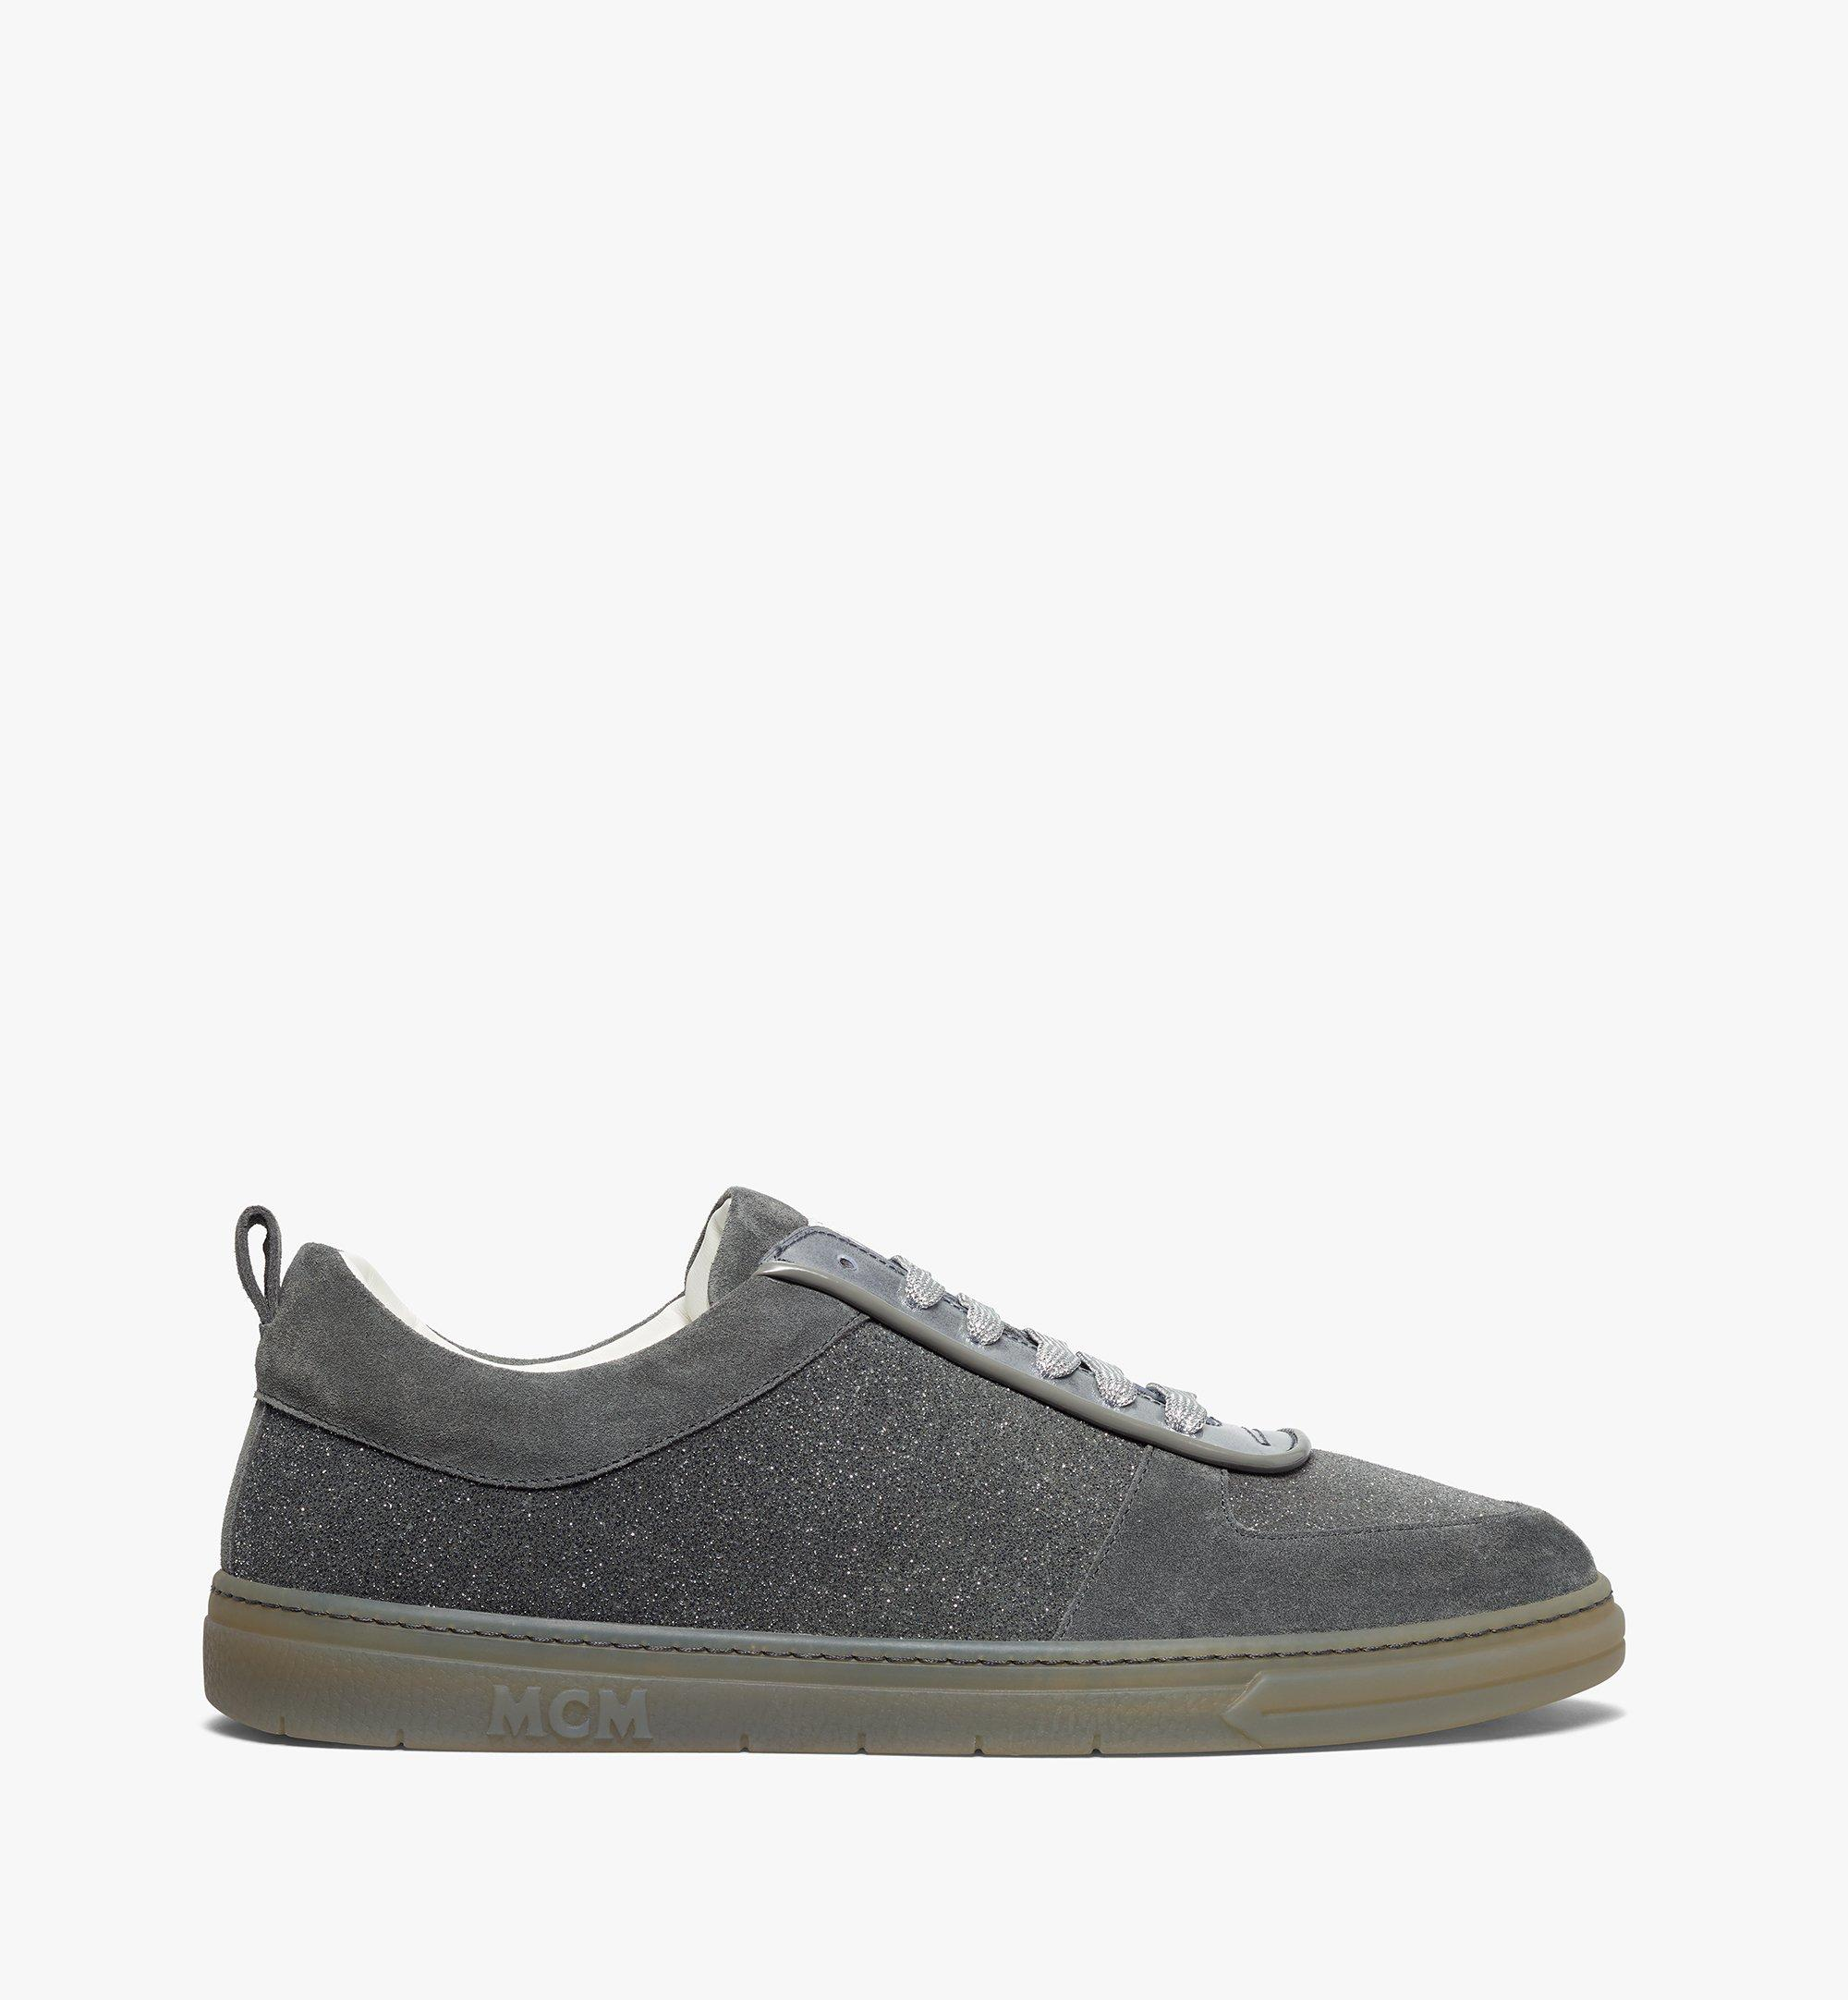 MCM Men's Terrain Lo Sneakers in Multi-Suede Leather Grey MEXBSMM06EO042 Alternate View 3